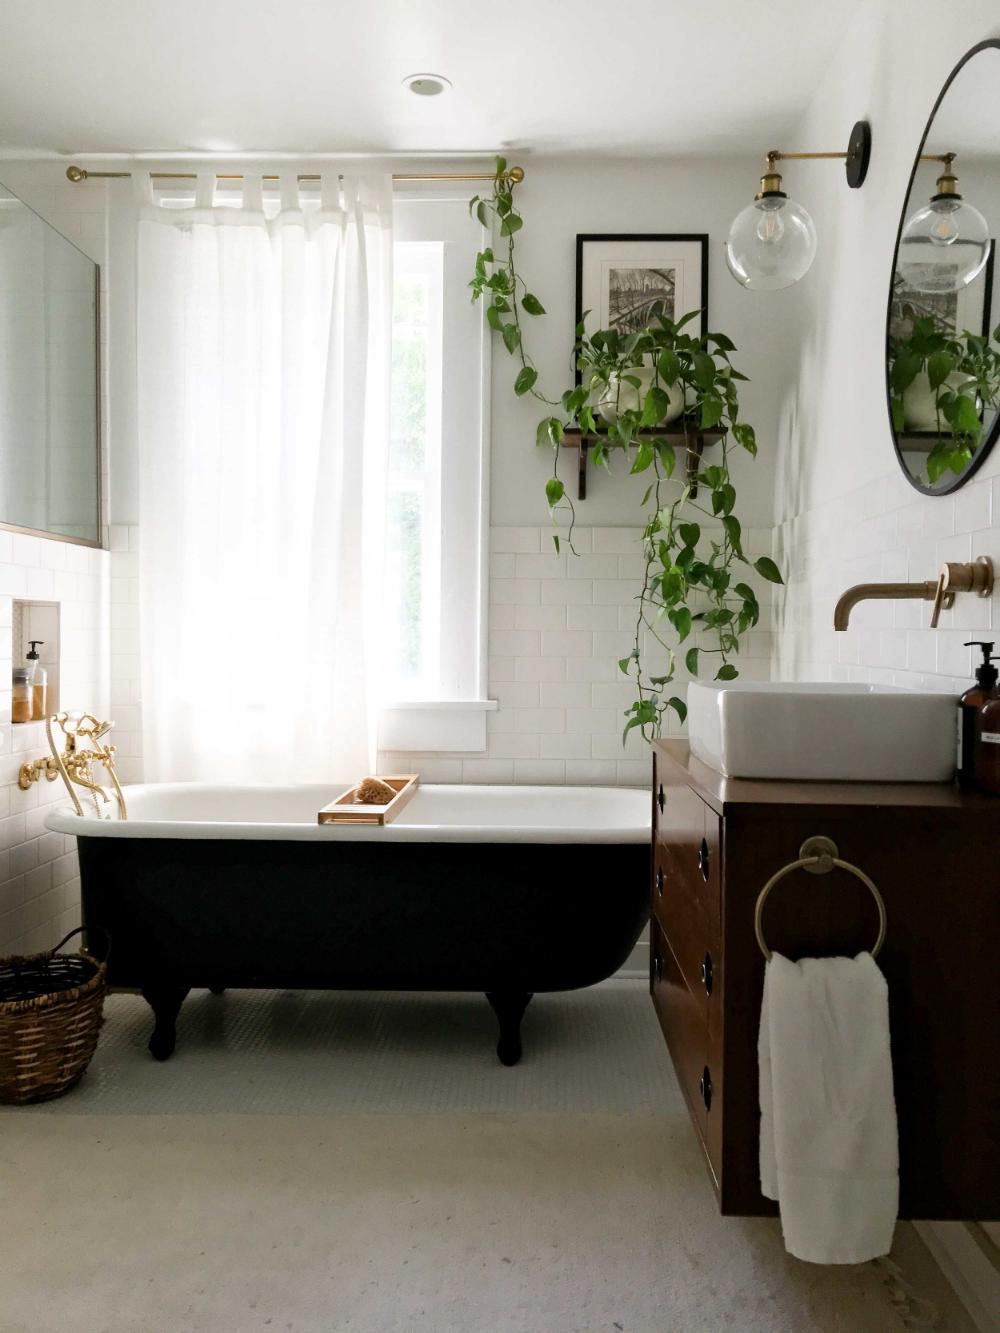 A 1920s Tulsa Owen Park Sears Kit Home | Vintage bathroom ...